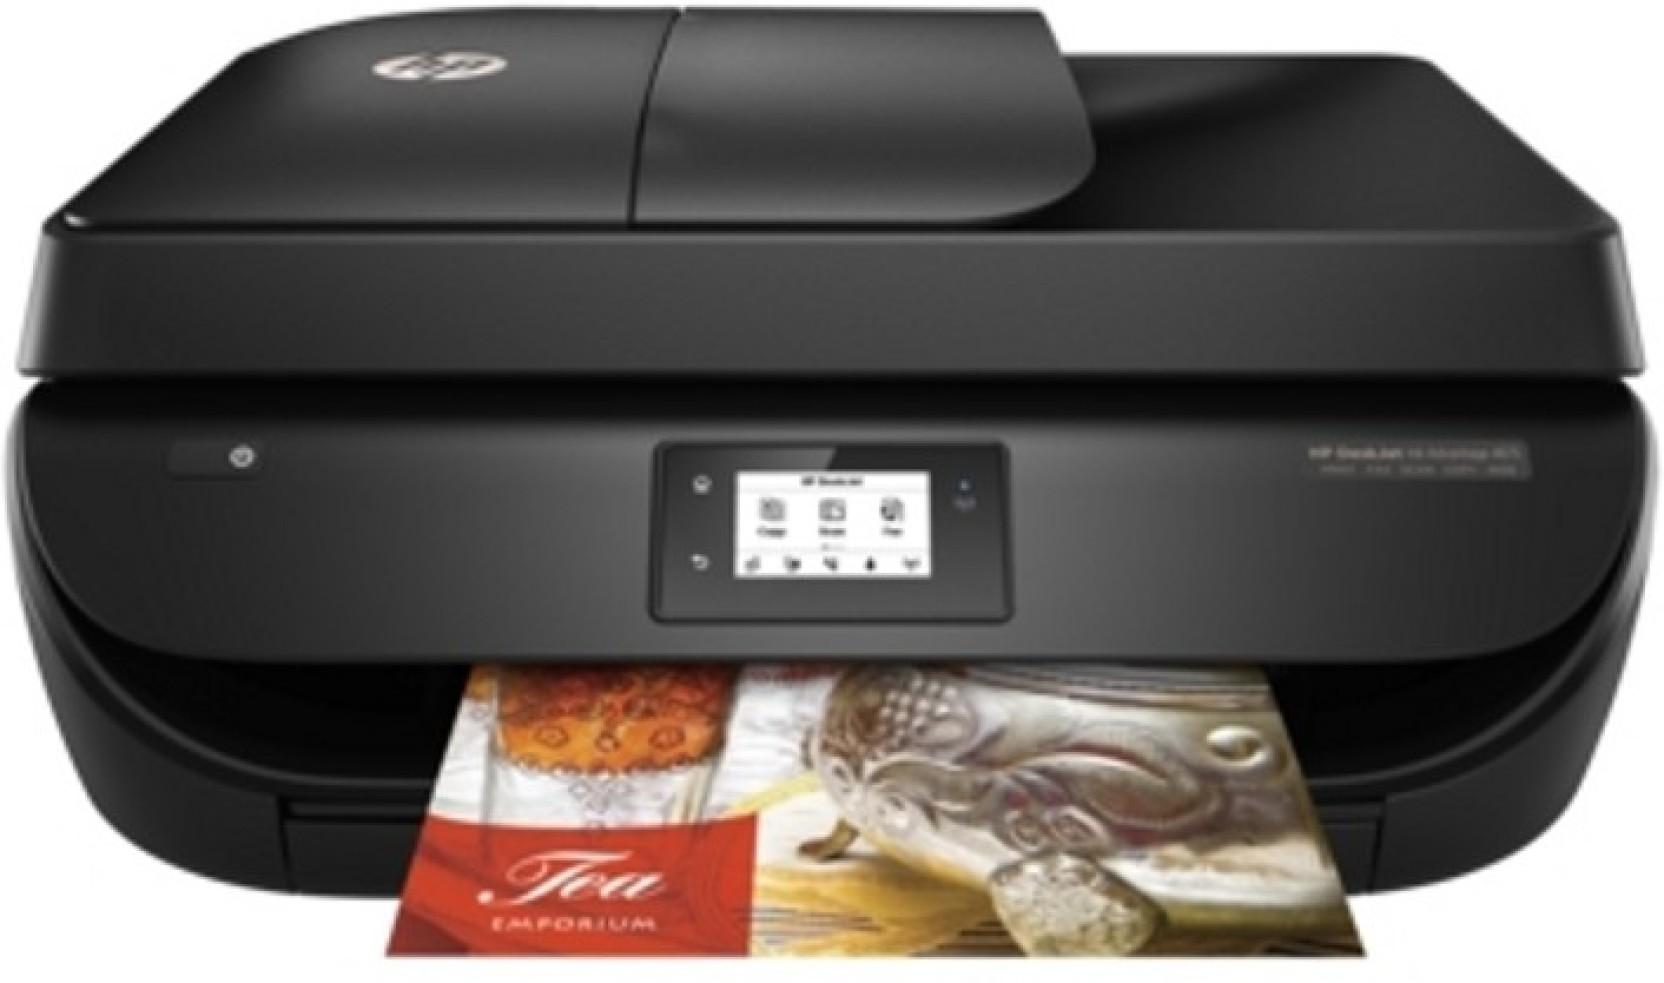 Hp Deskjet Ink Advantage 4675 All In One Multi Function Wireless 680 Tri Color Original Cartridge Home